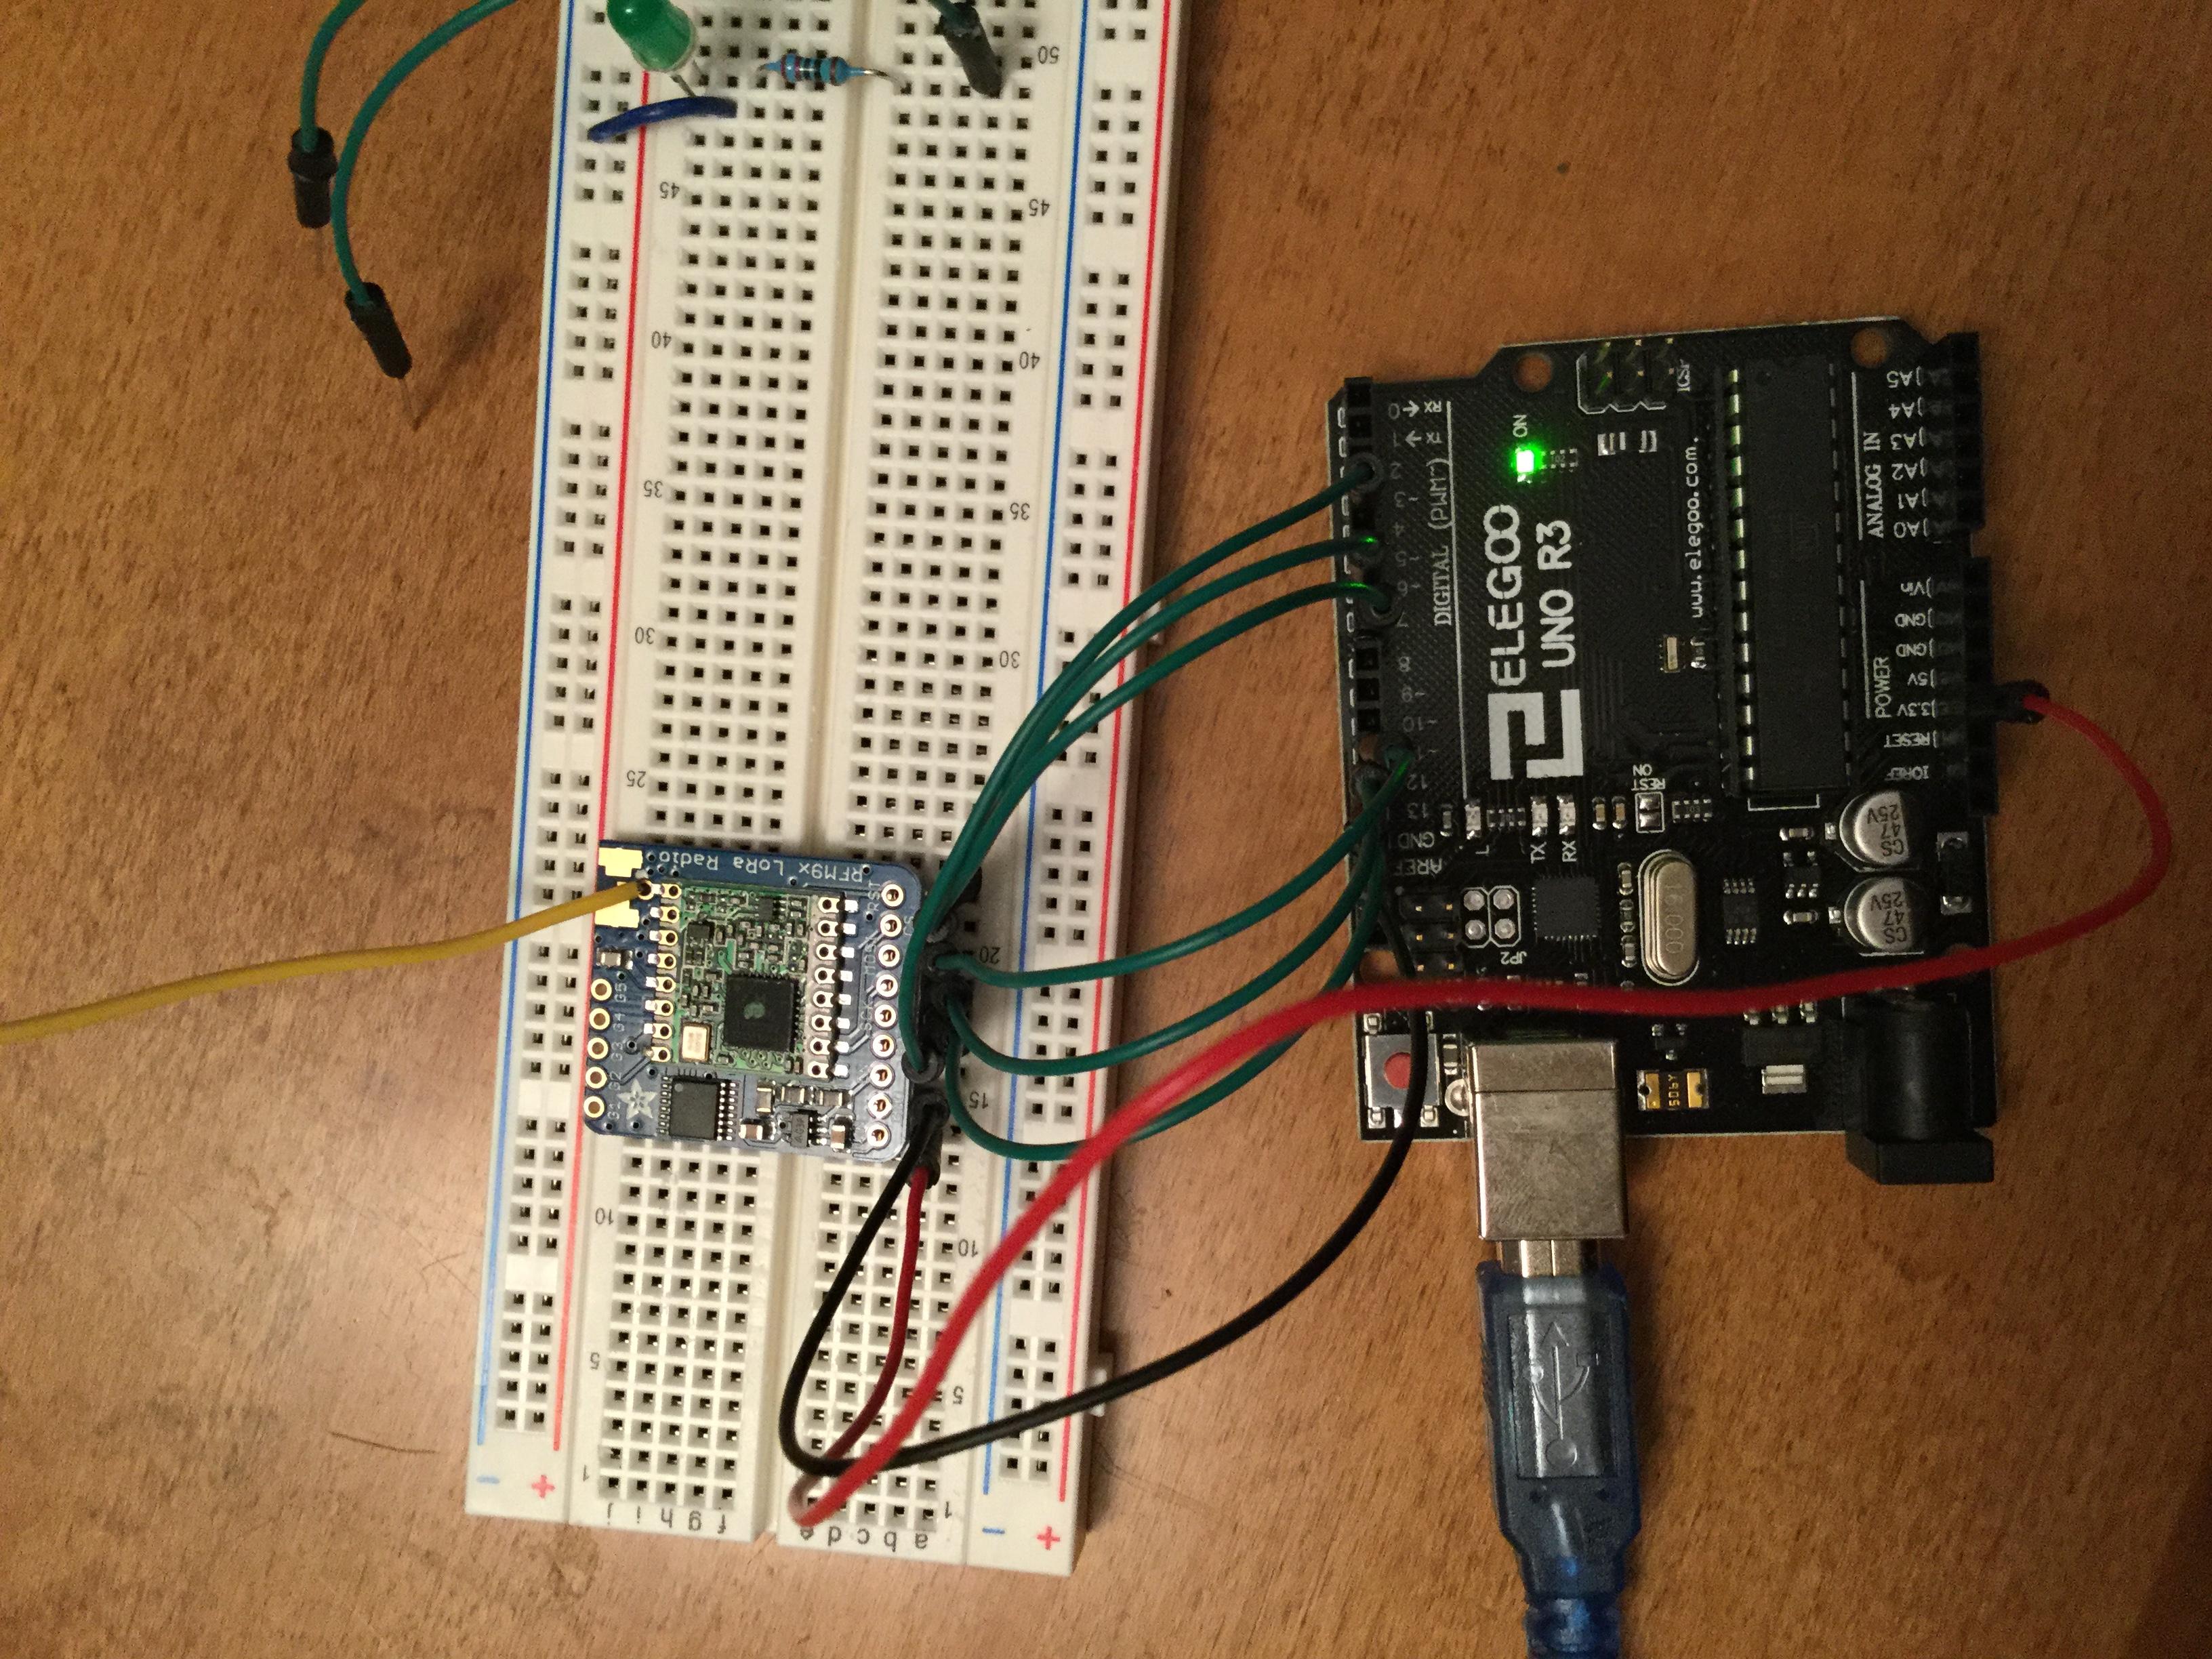 LoRa initialization fails · Issue #74 · sandeepmistry/arduino-LoRa